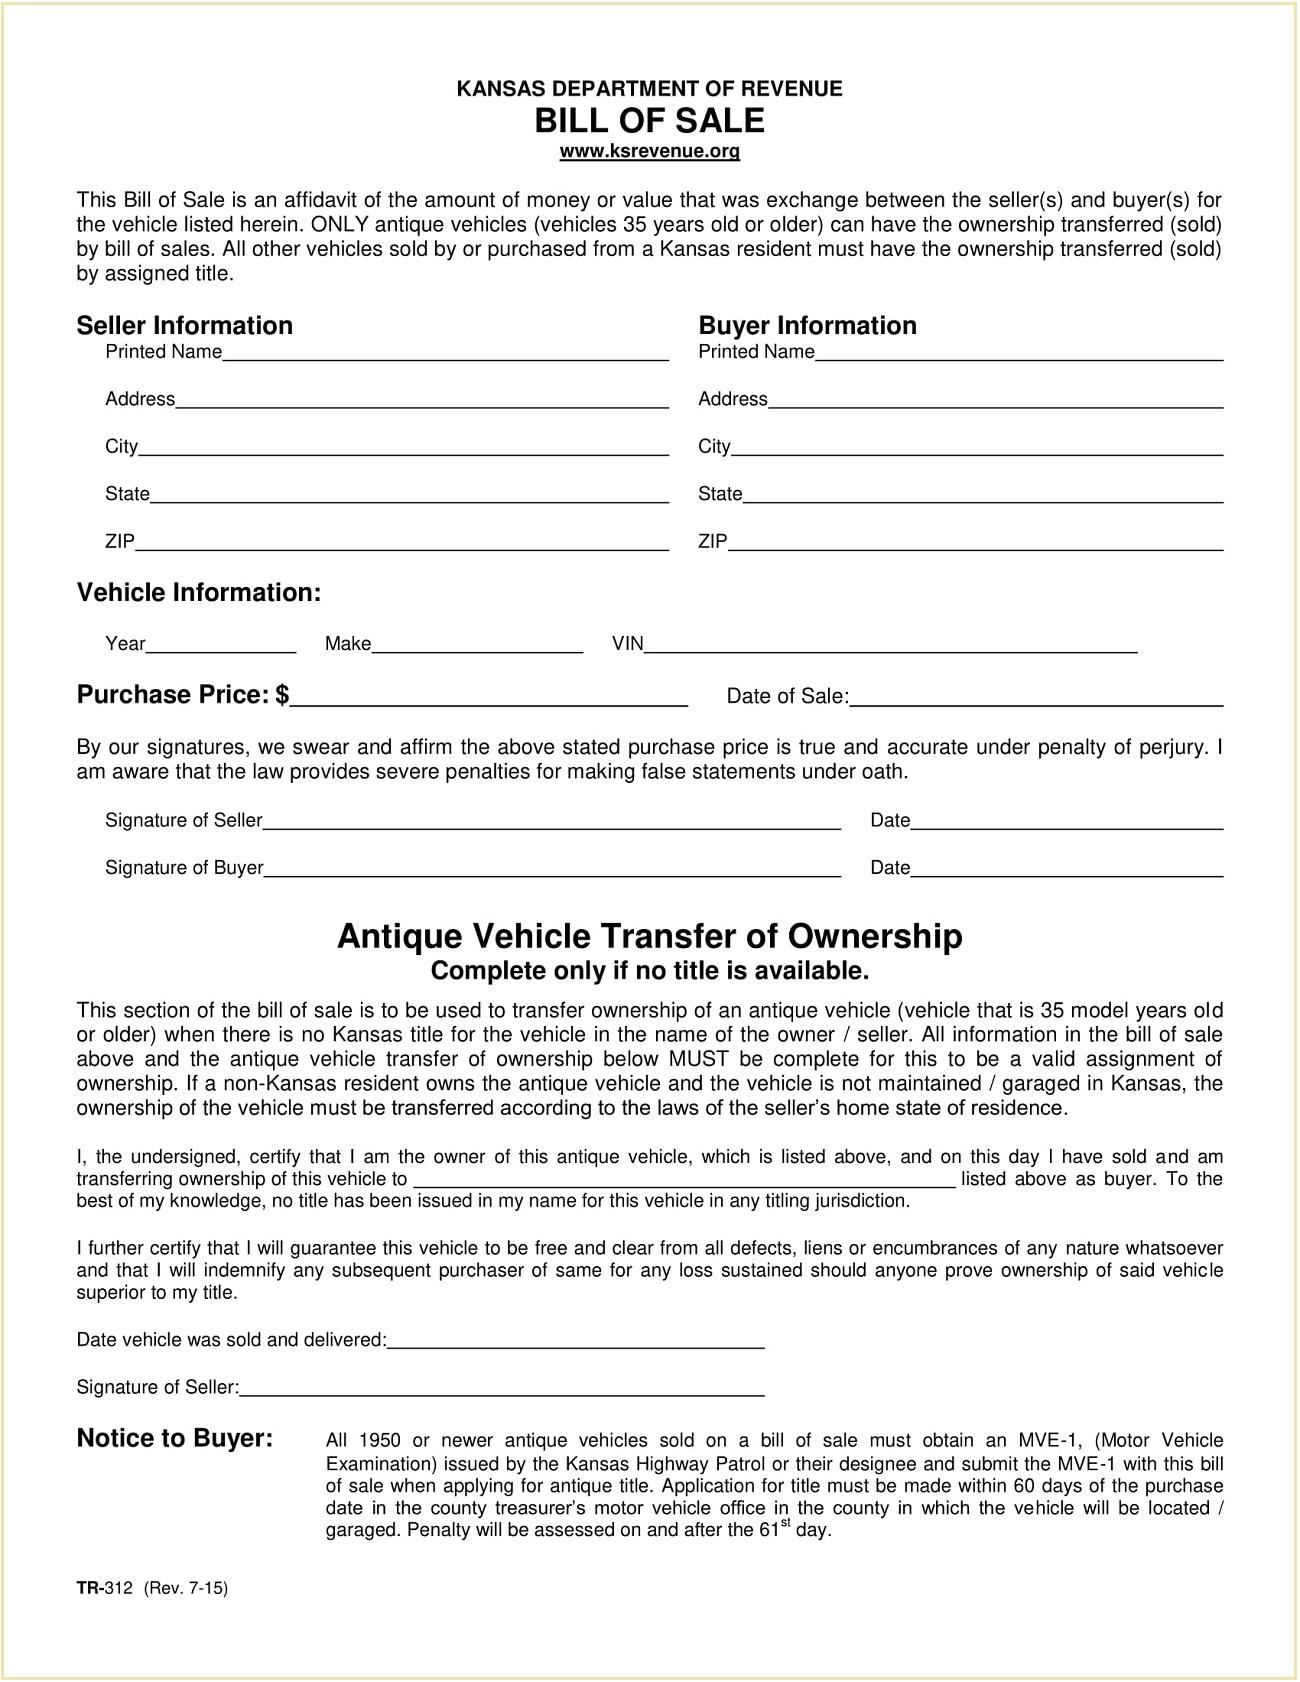 Form TR 312 Kansas Motor Vehicle Bill of Sale Template PDF